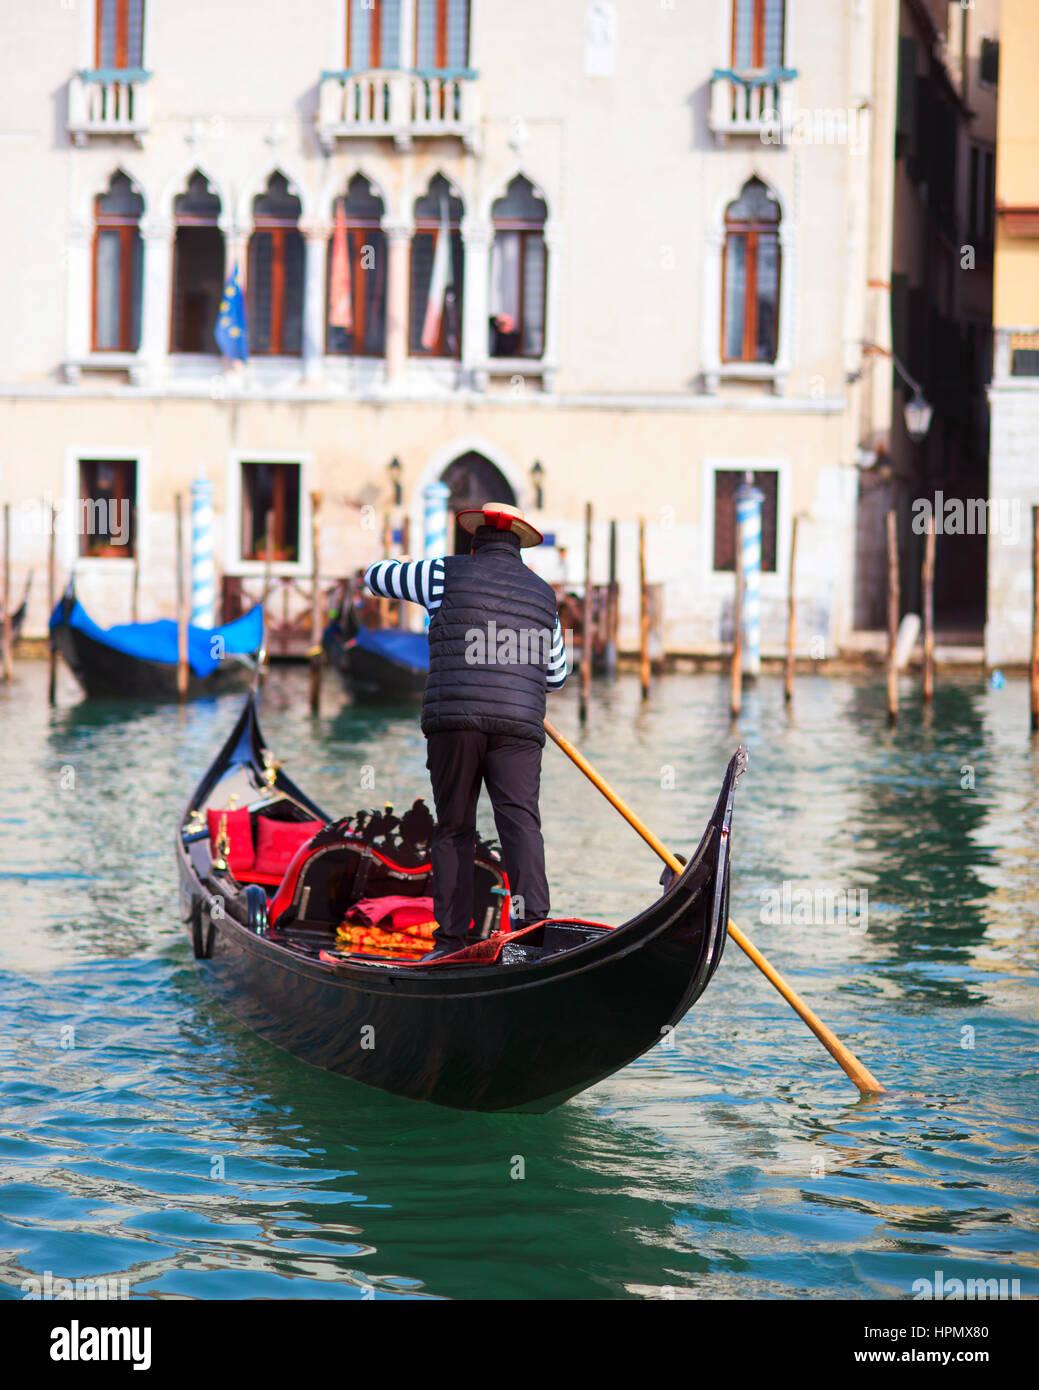 Gondolier in Venice, Italy - Stock Image